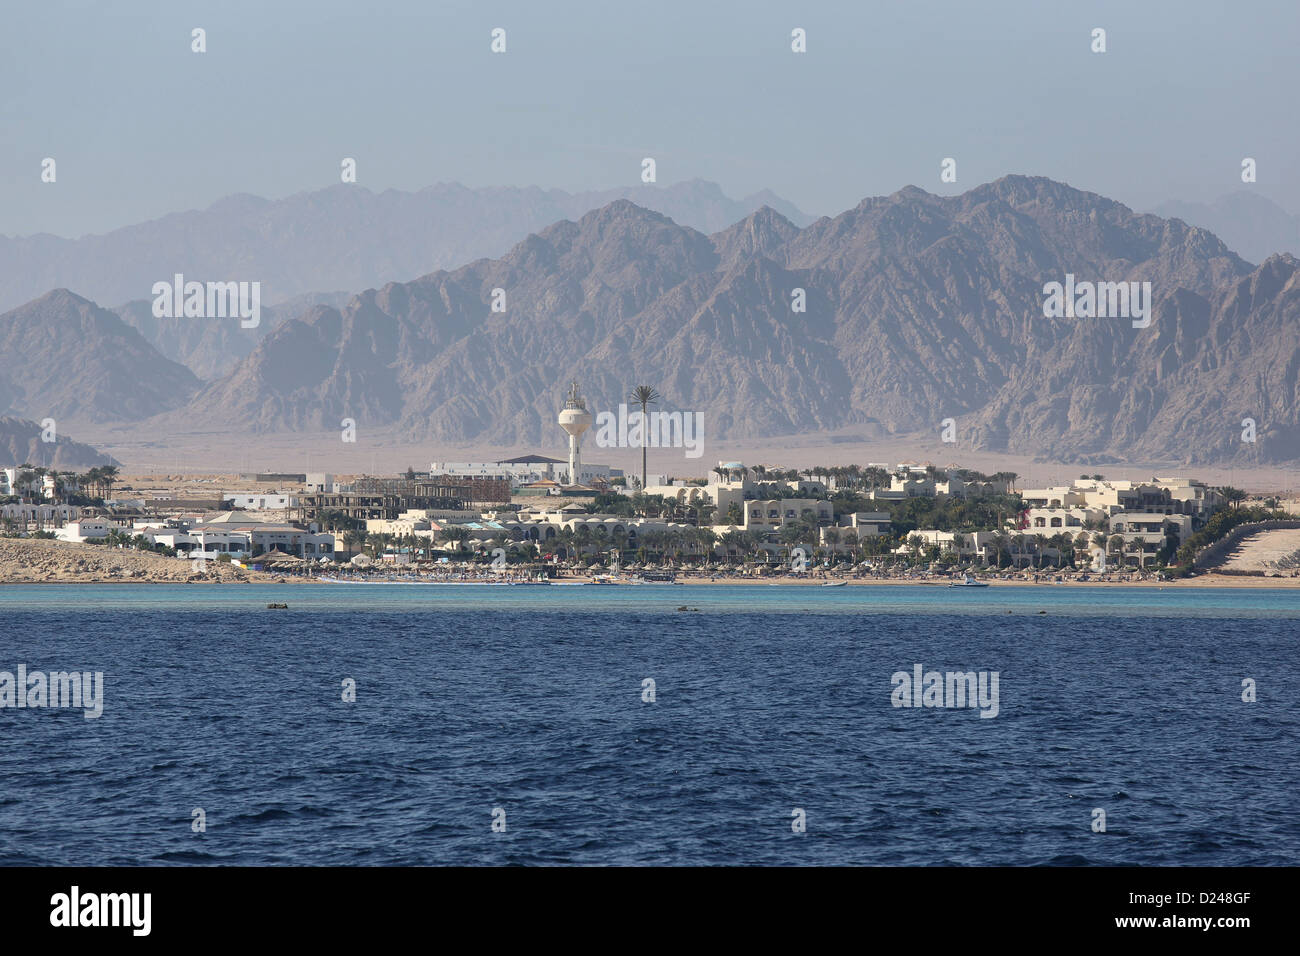 The Red Sea, Sharm El Sheikh, Egypt - Stock Image